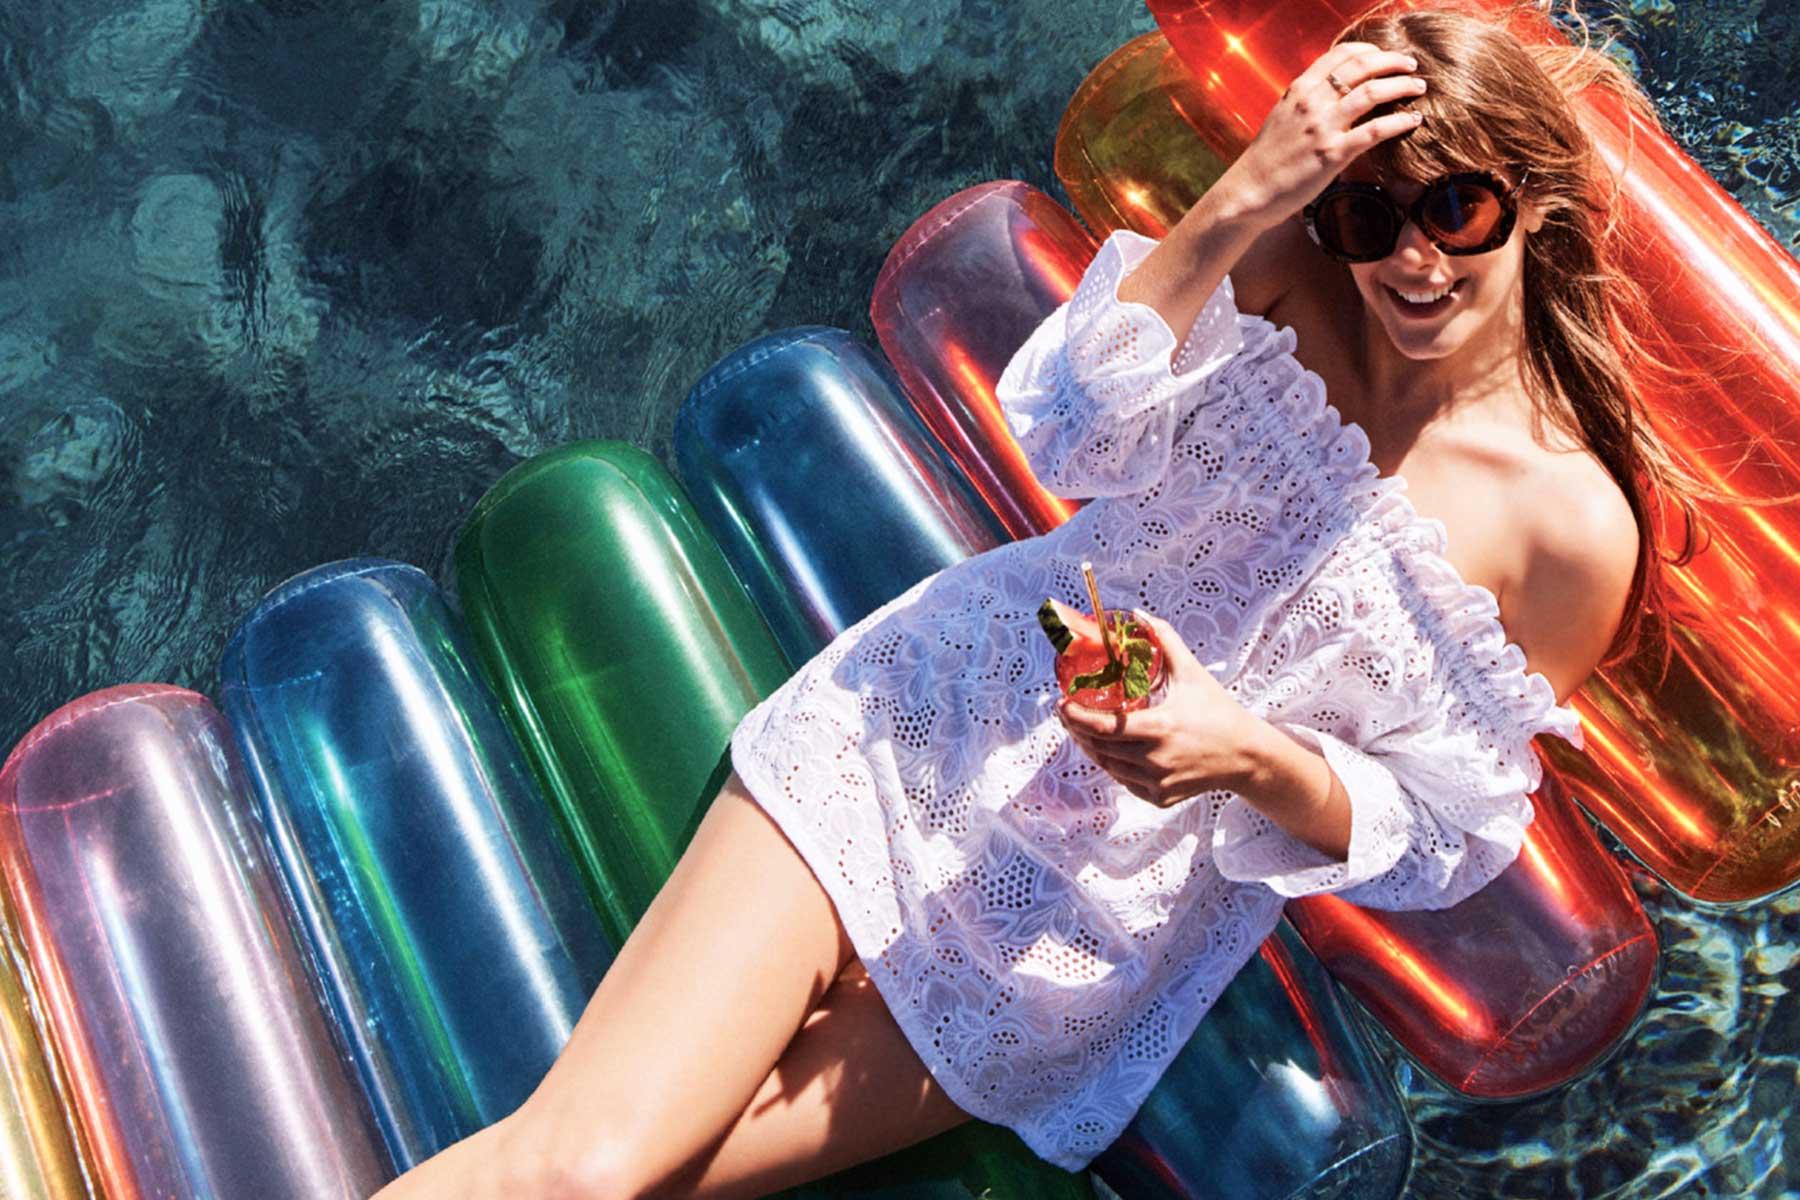 ©-Adam-Robinson-Design-Pool-Party-03.jpg